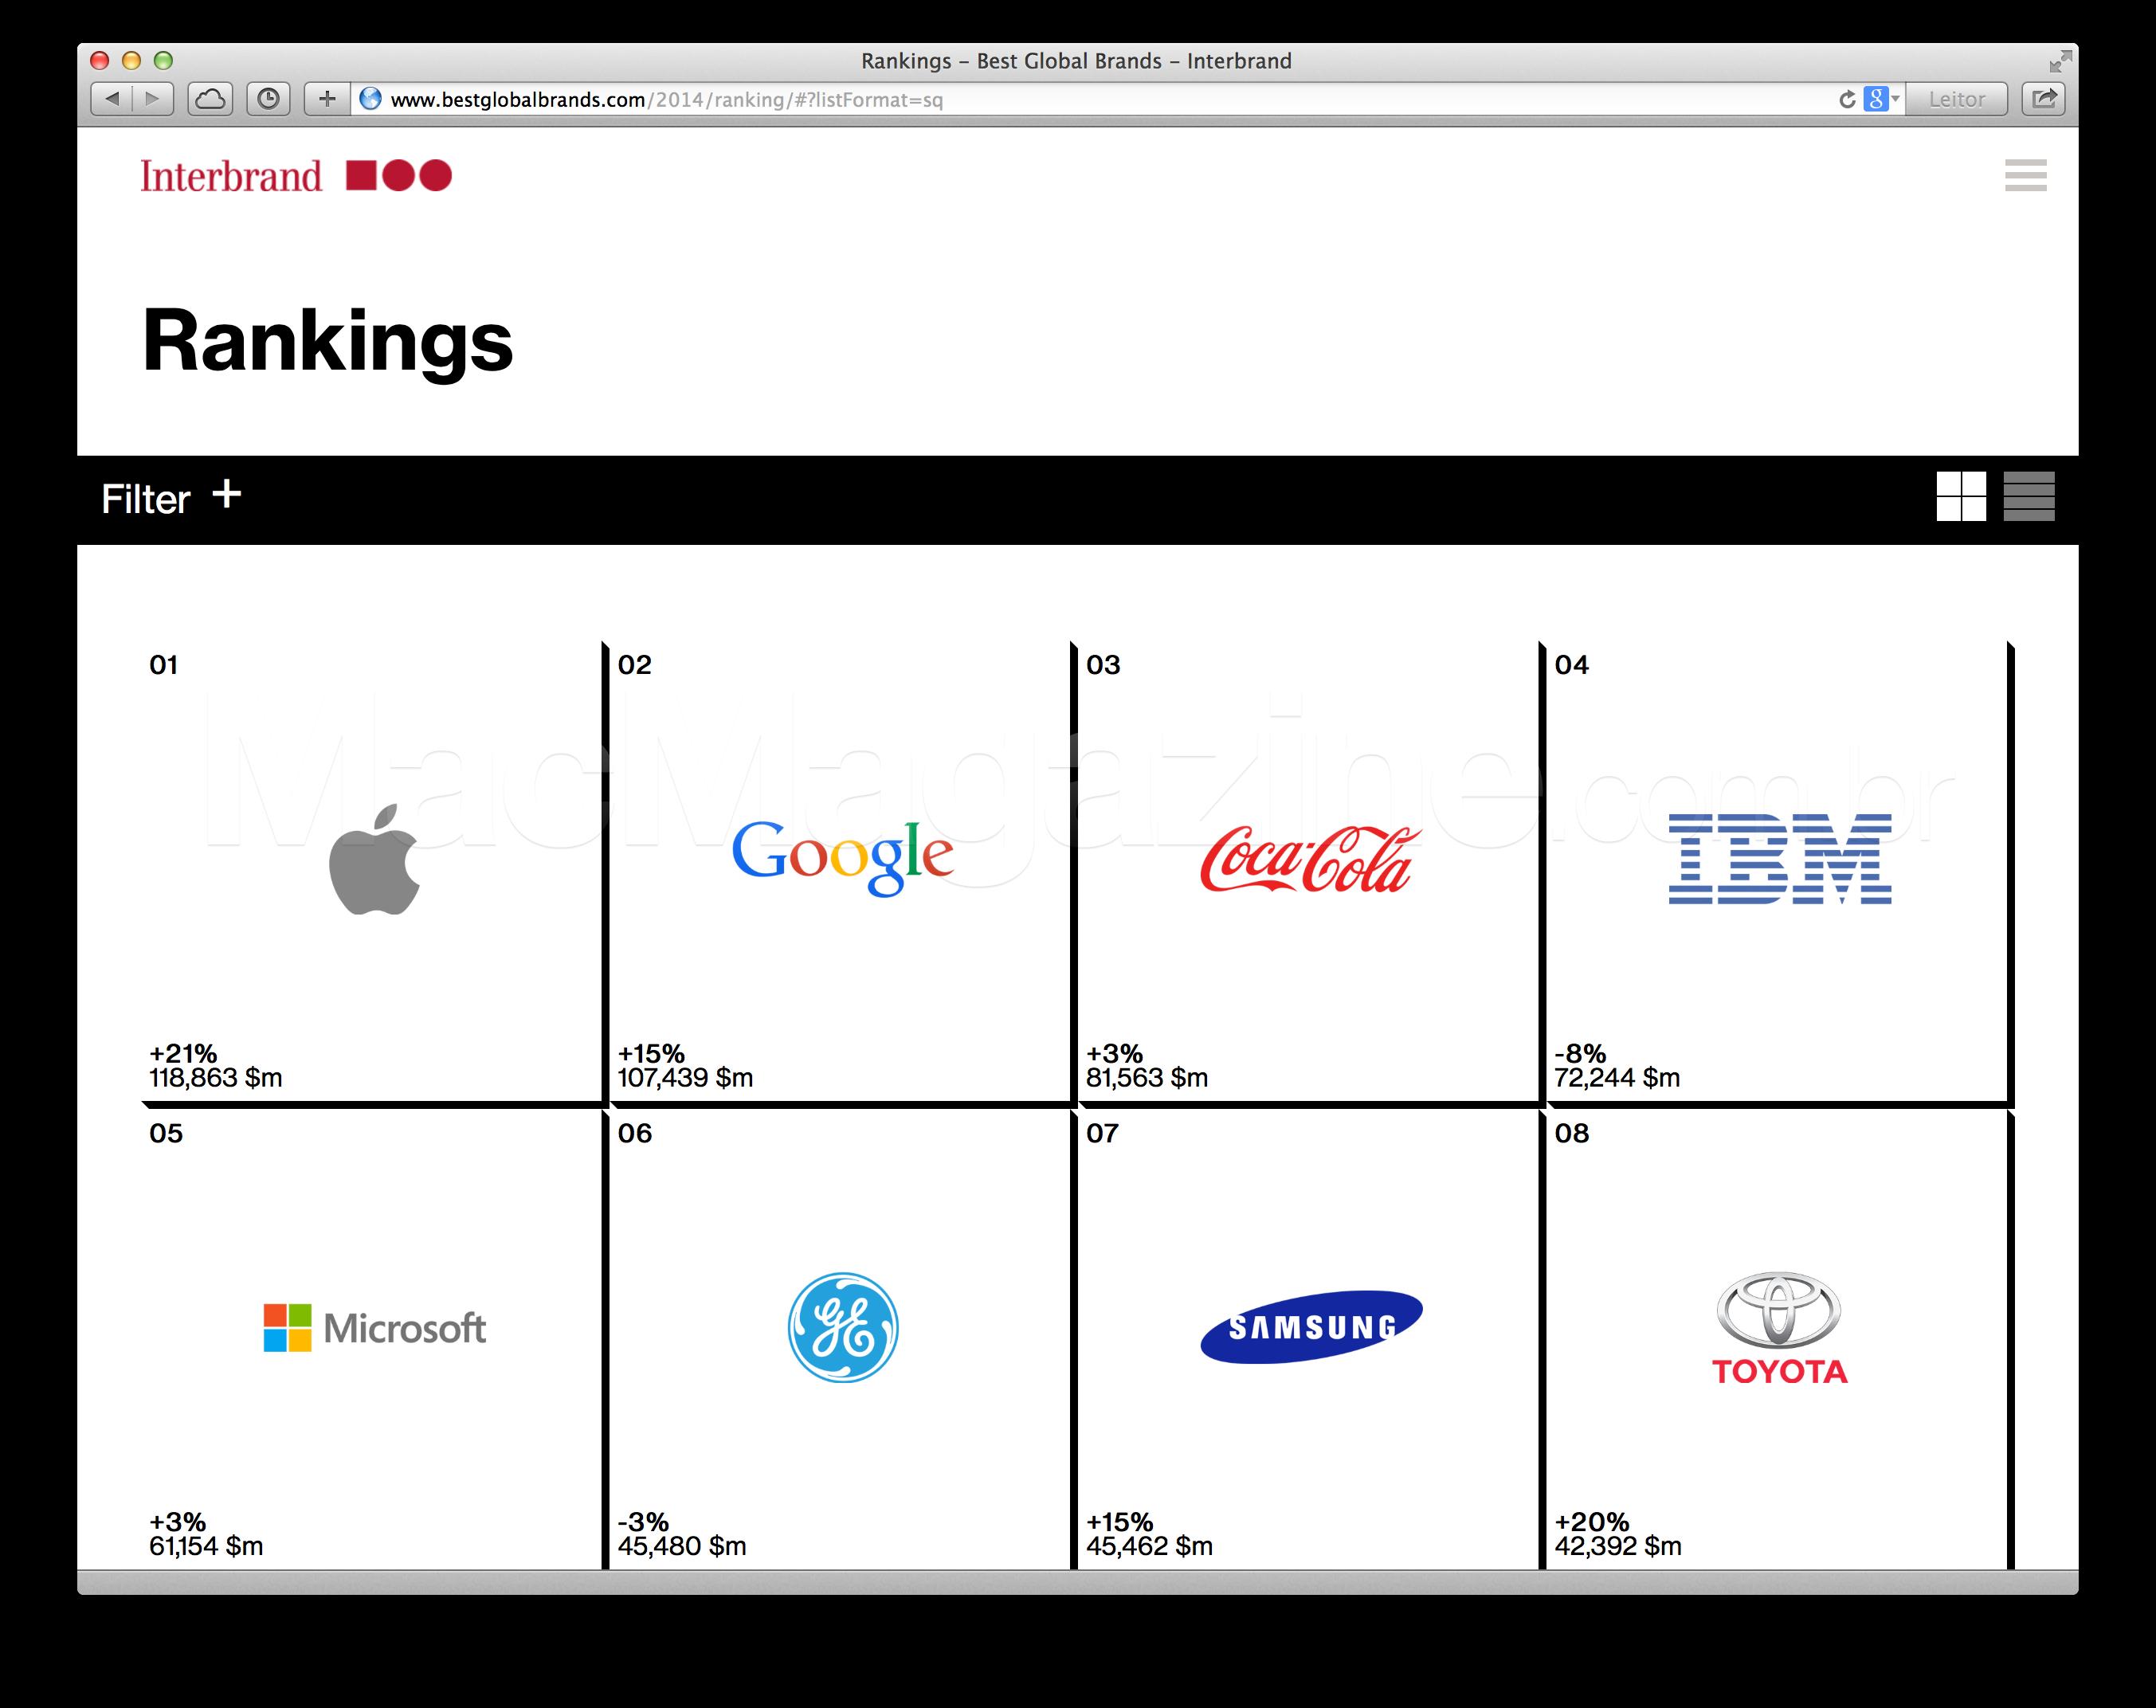 Ranking da Interbrand